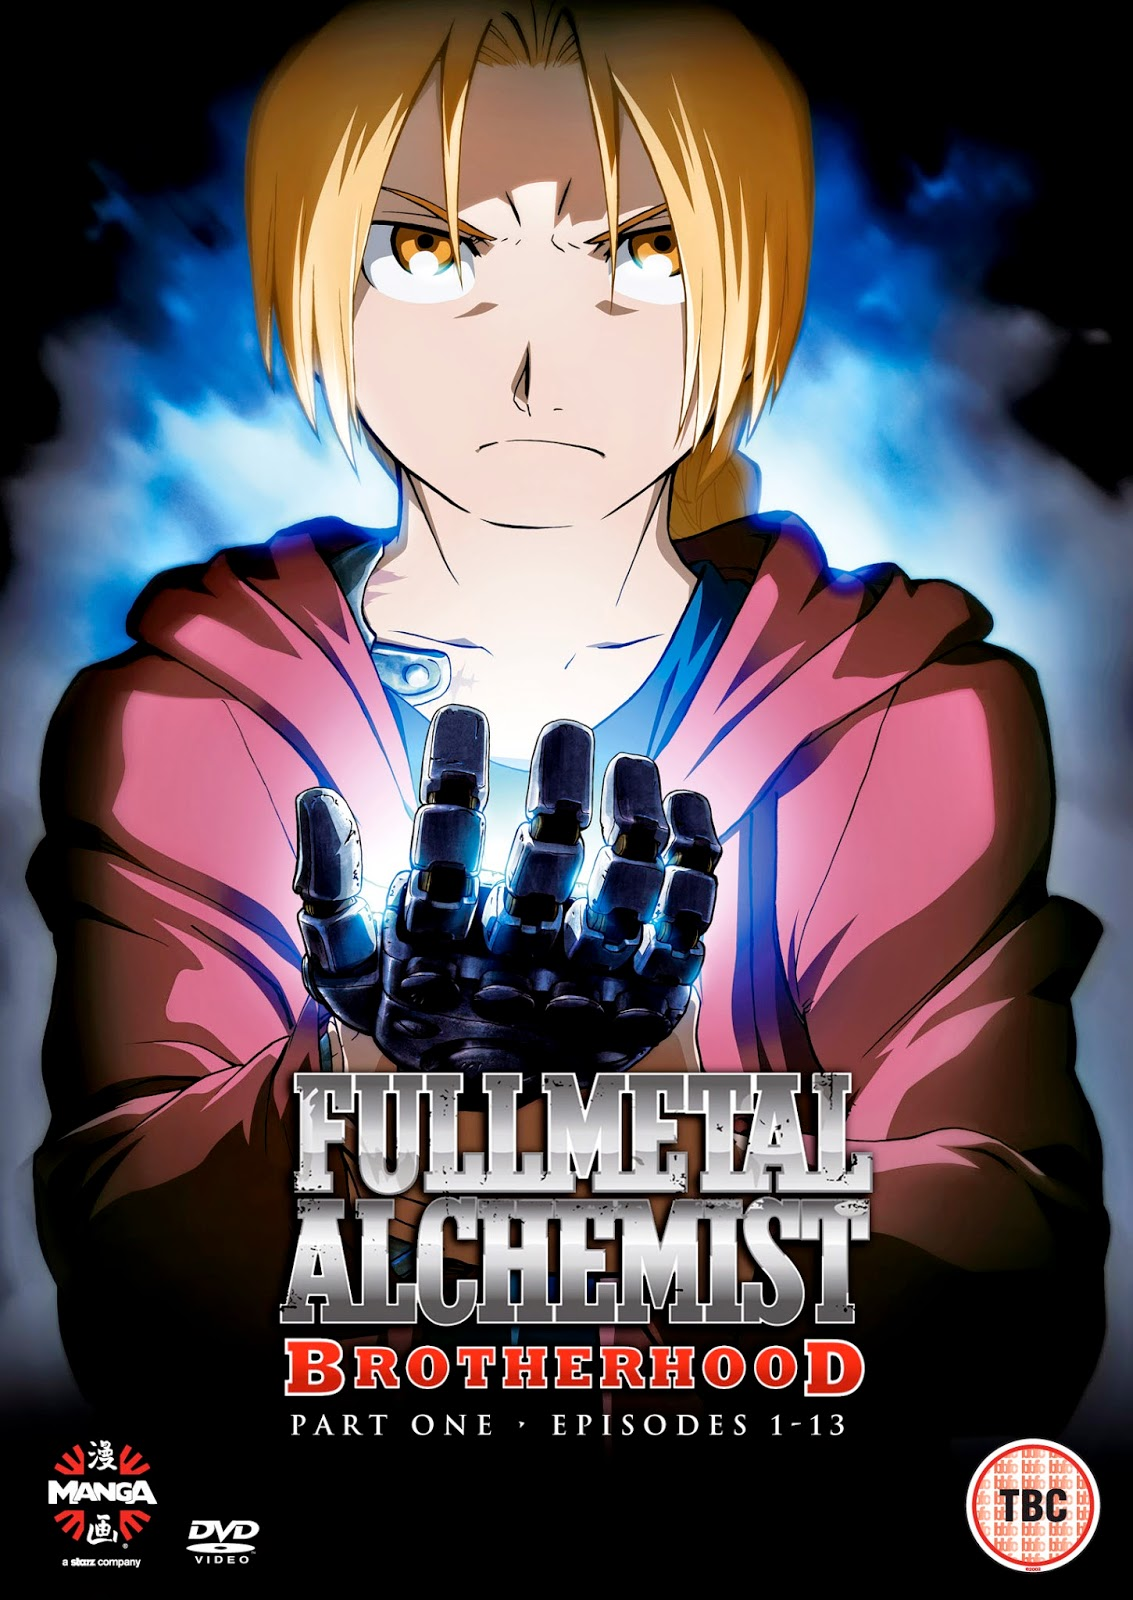 Fullmetal Alchemist Brotherhood Ending 2 Full Mp3 Download - Full Metal